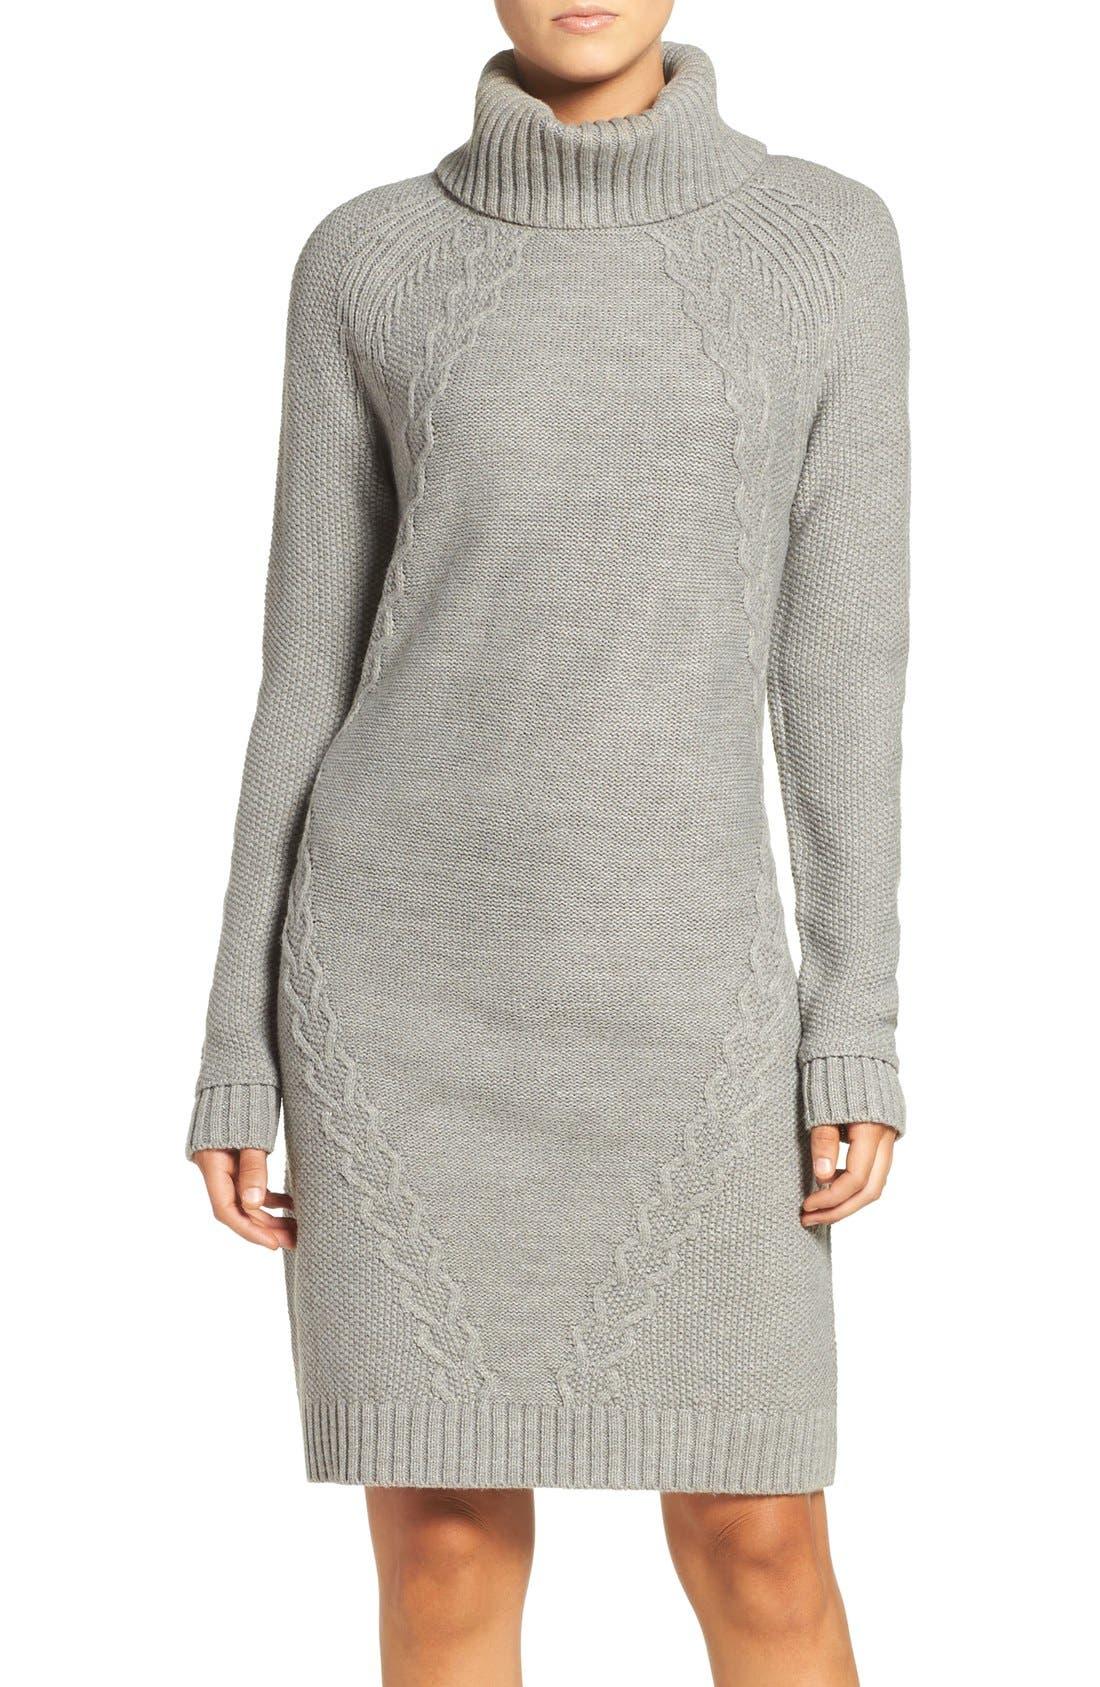 Eliza J Cable Knit Sweater Dress (Regular & Petite) | Nordstrom